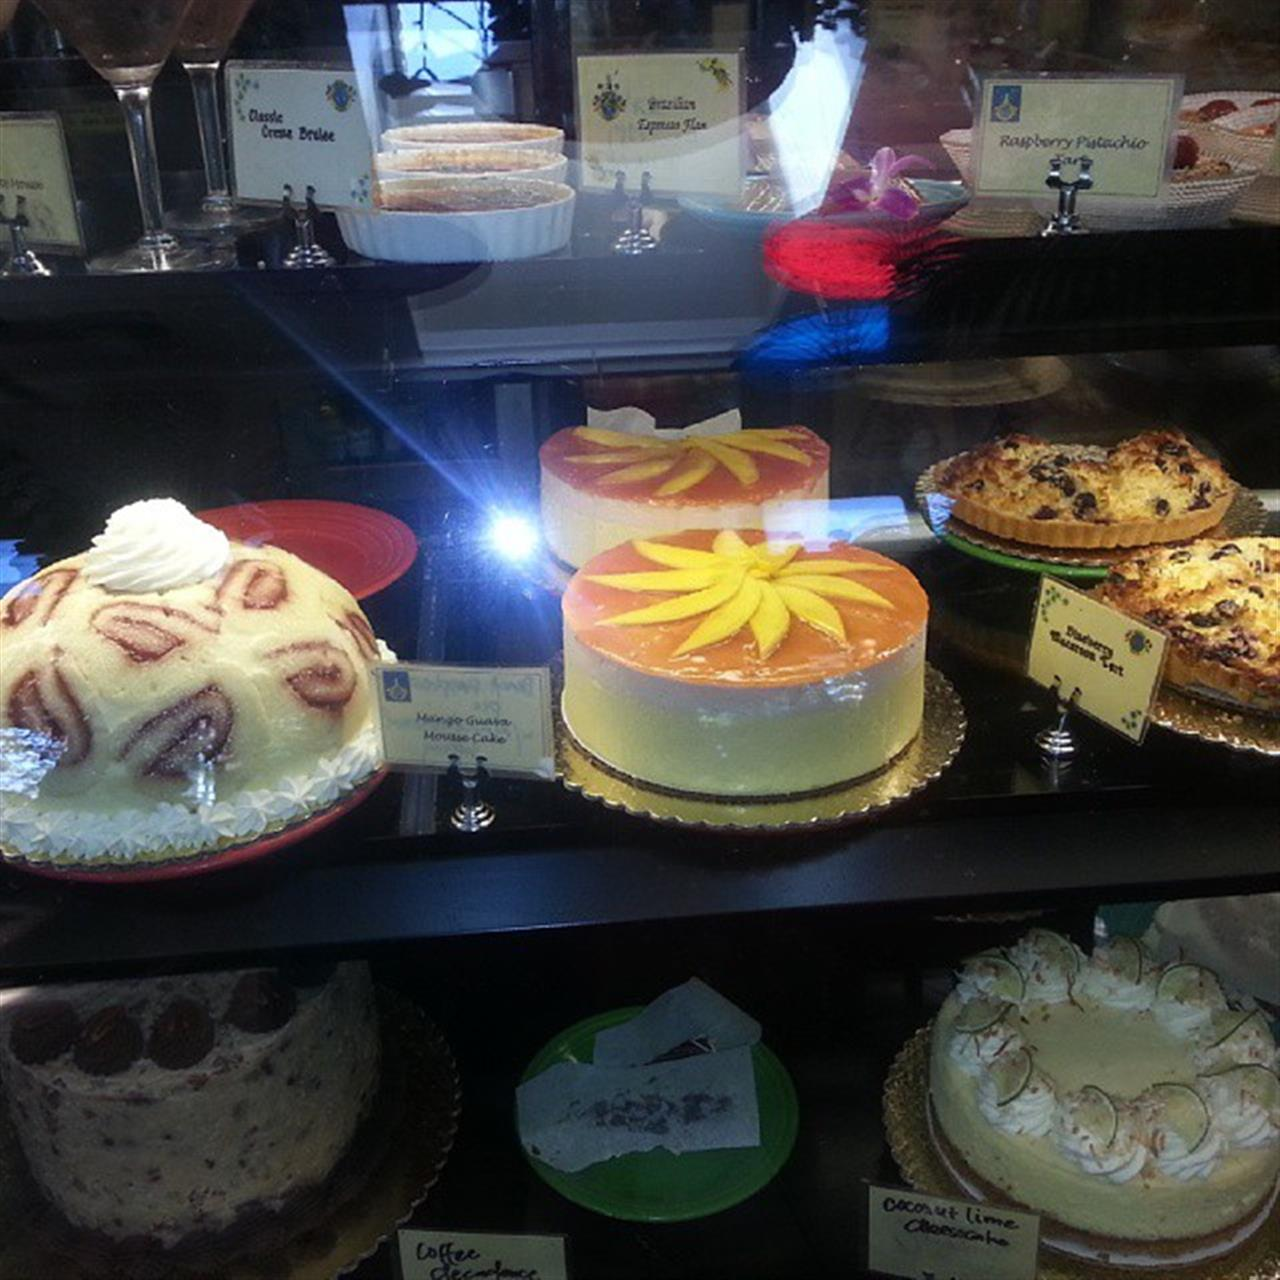 #Yummy #desserts #towercafe #leadingrelocal #lyonrealestate #sacramentoca